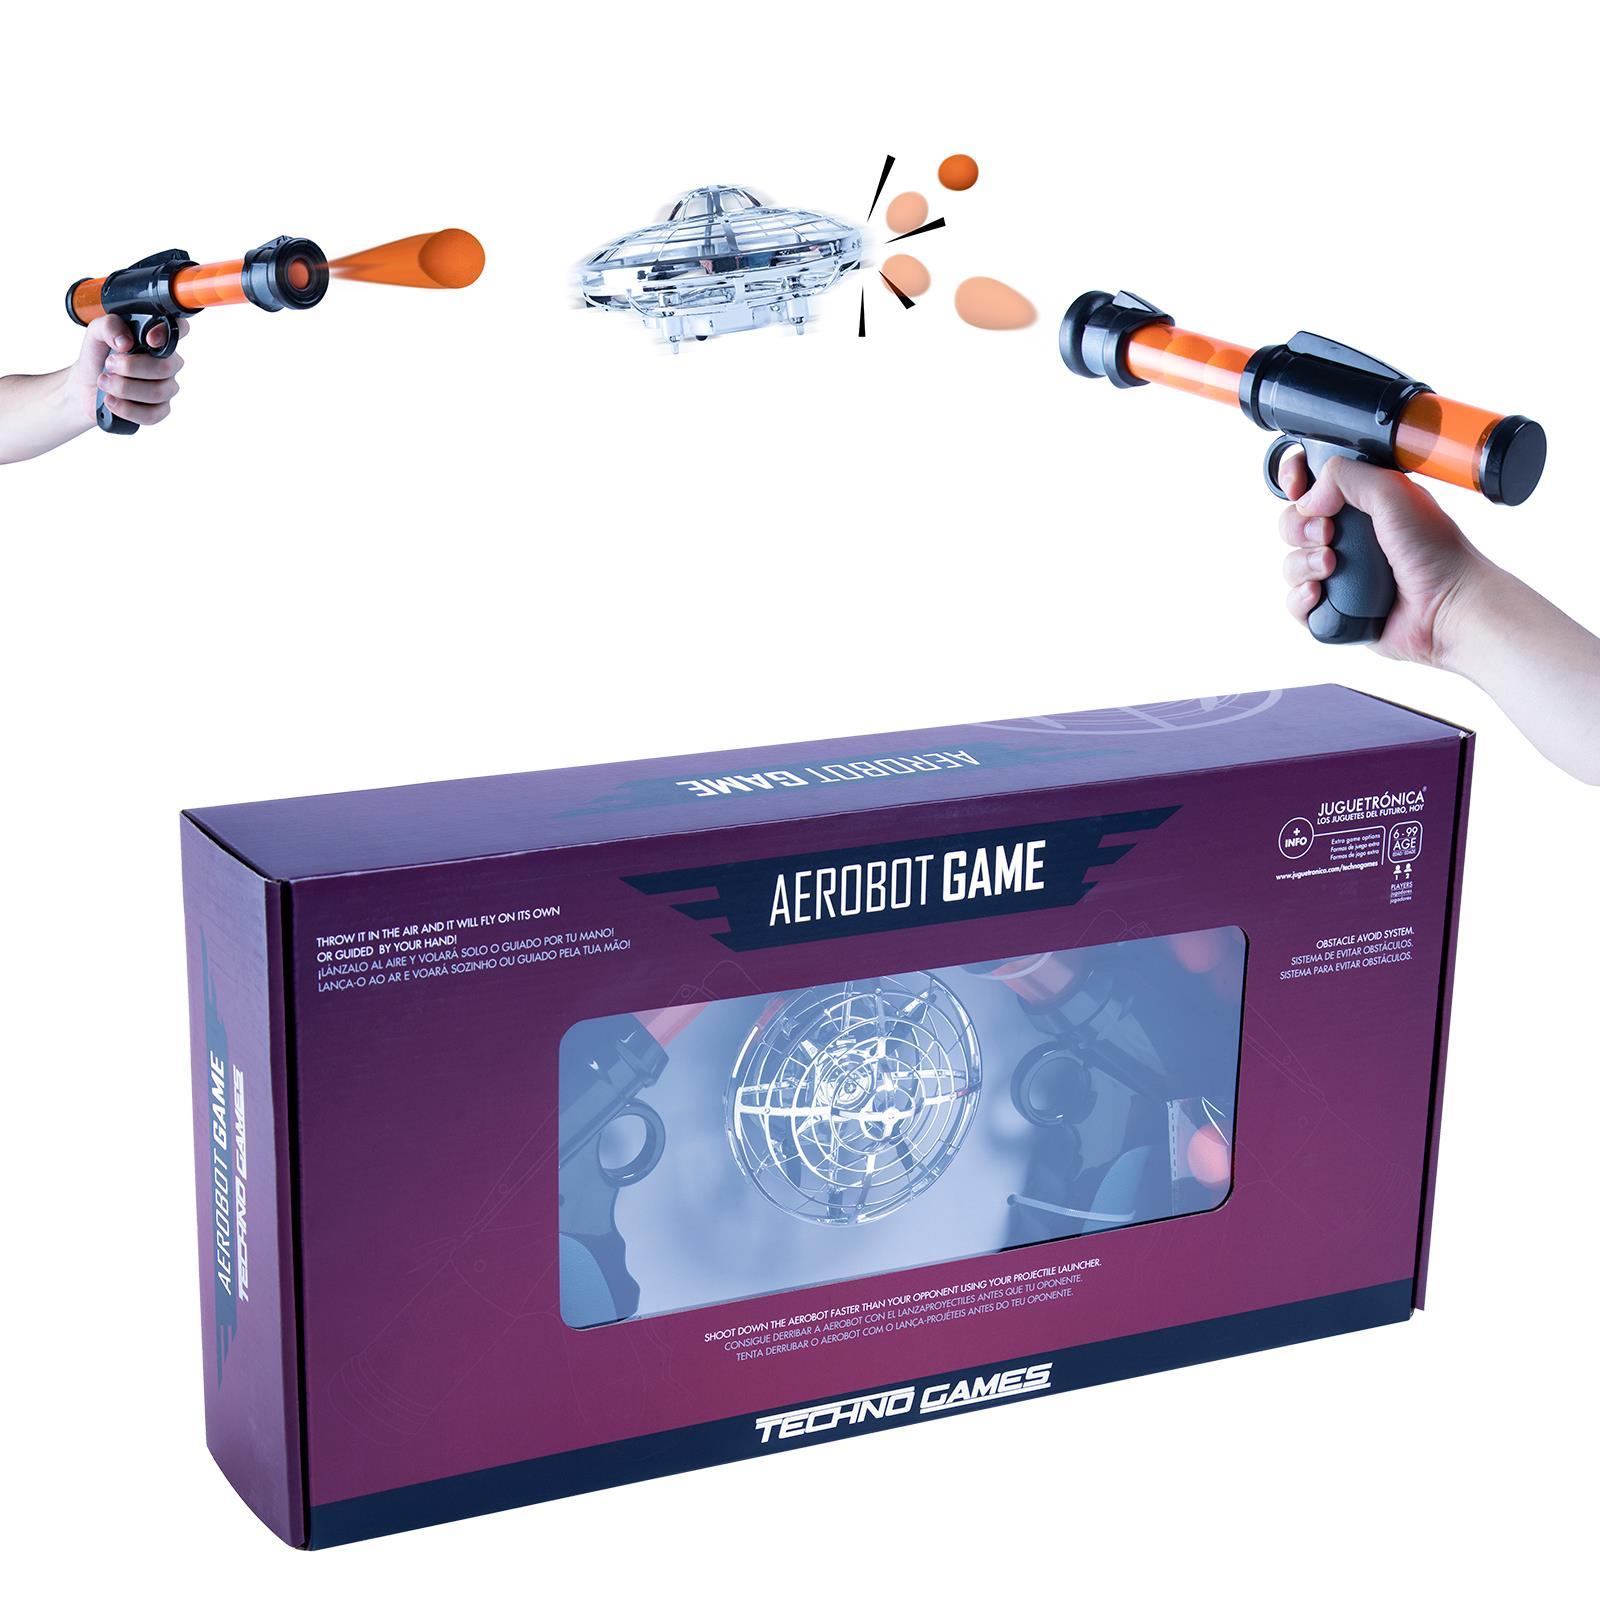 Gra Aerobot. Technogames